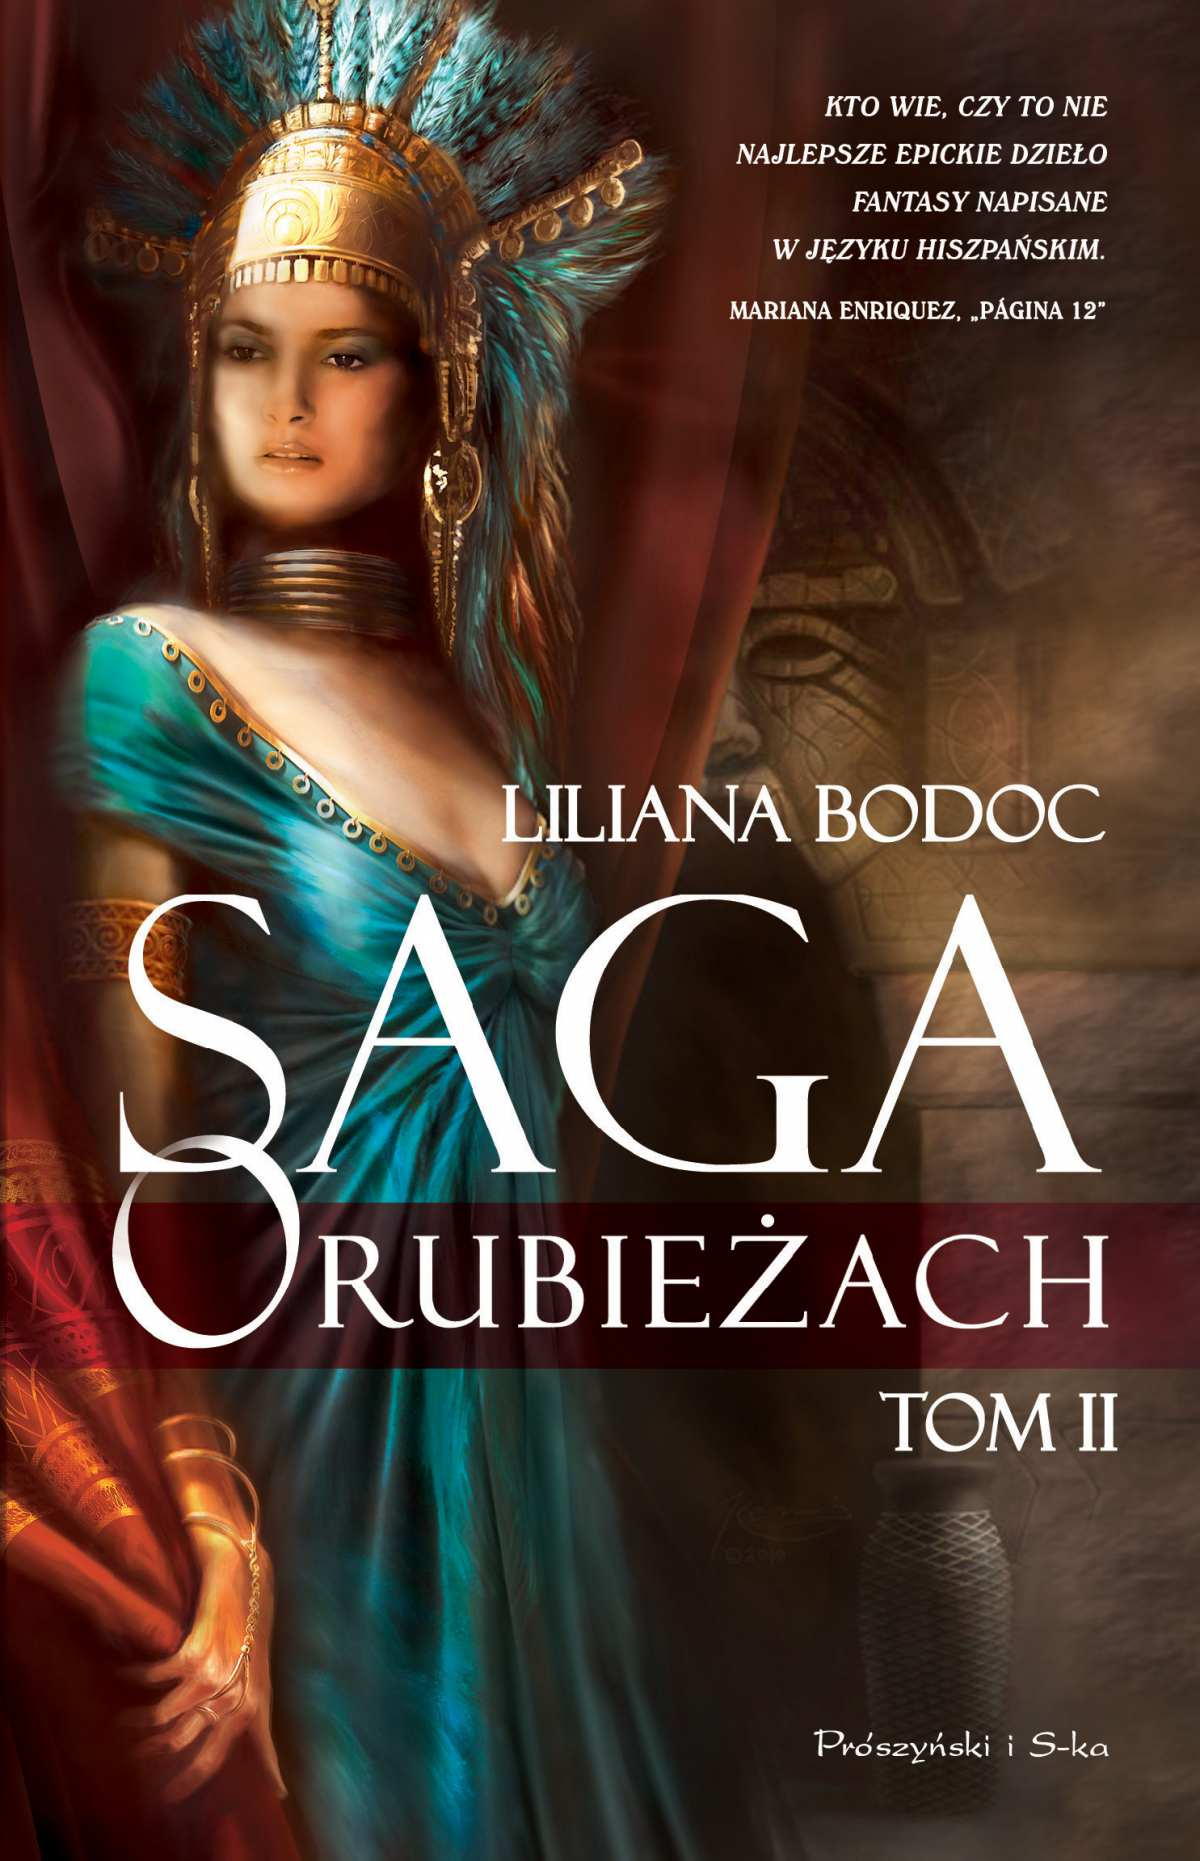 Saga o Rubieżach. Tom 2 - Ebook (Książka EPUB) do pobrania w formacie EPUB